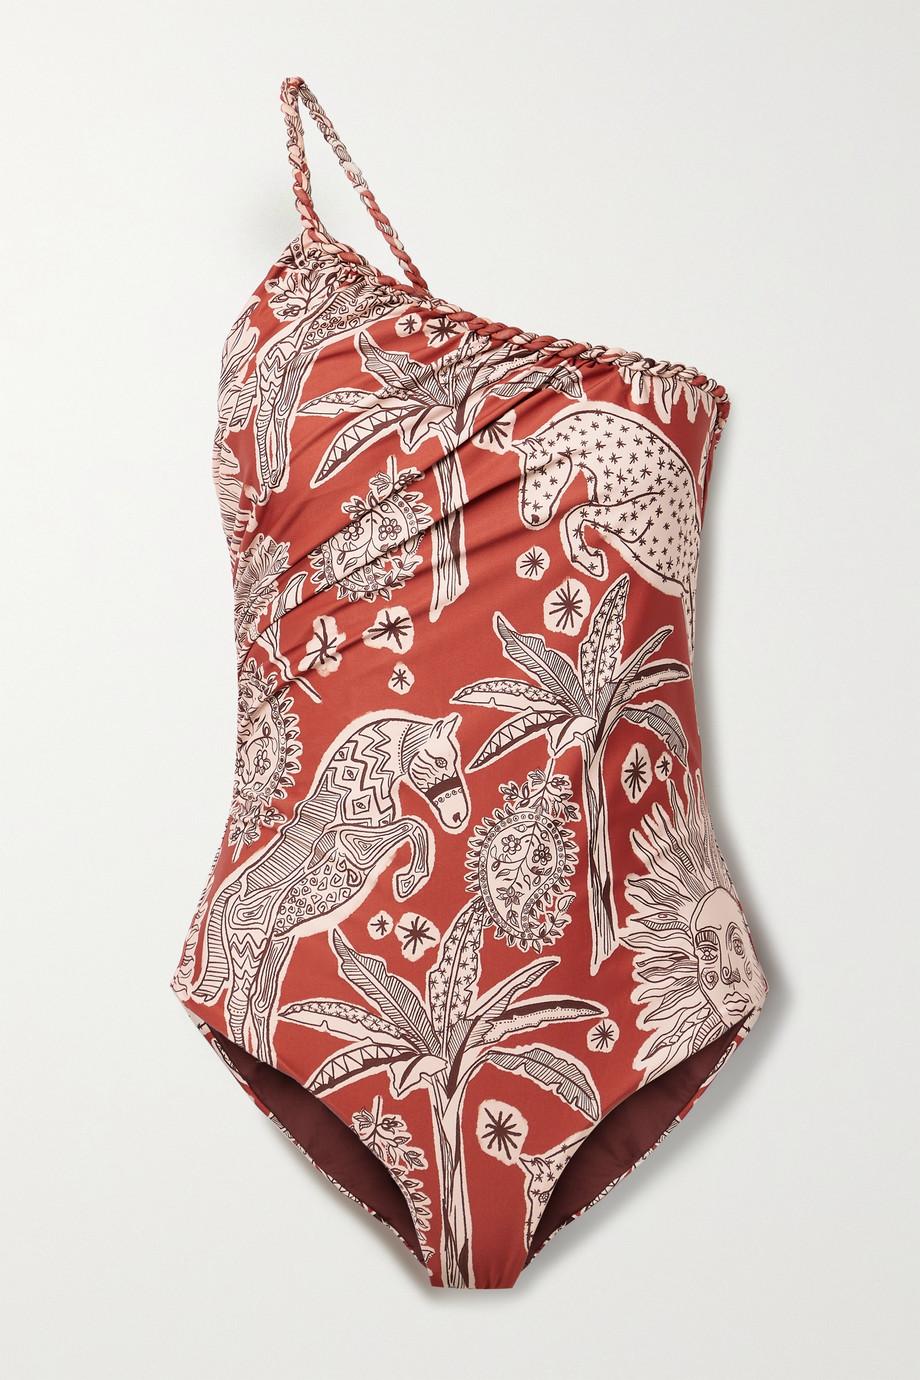 Johanna Ortiz + NET SUSTAIN Mar De Plata bedruckter Badeanzug aus recyceltem Stretch-Material mit asymmetrischer Schulterpartie